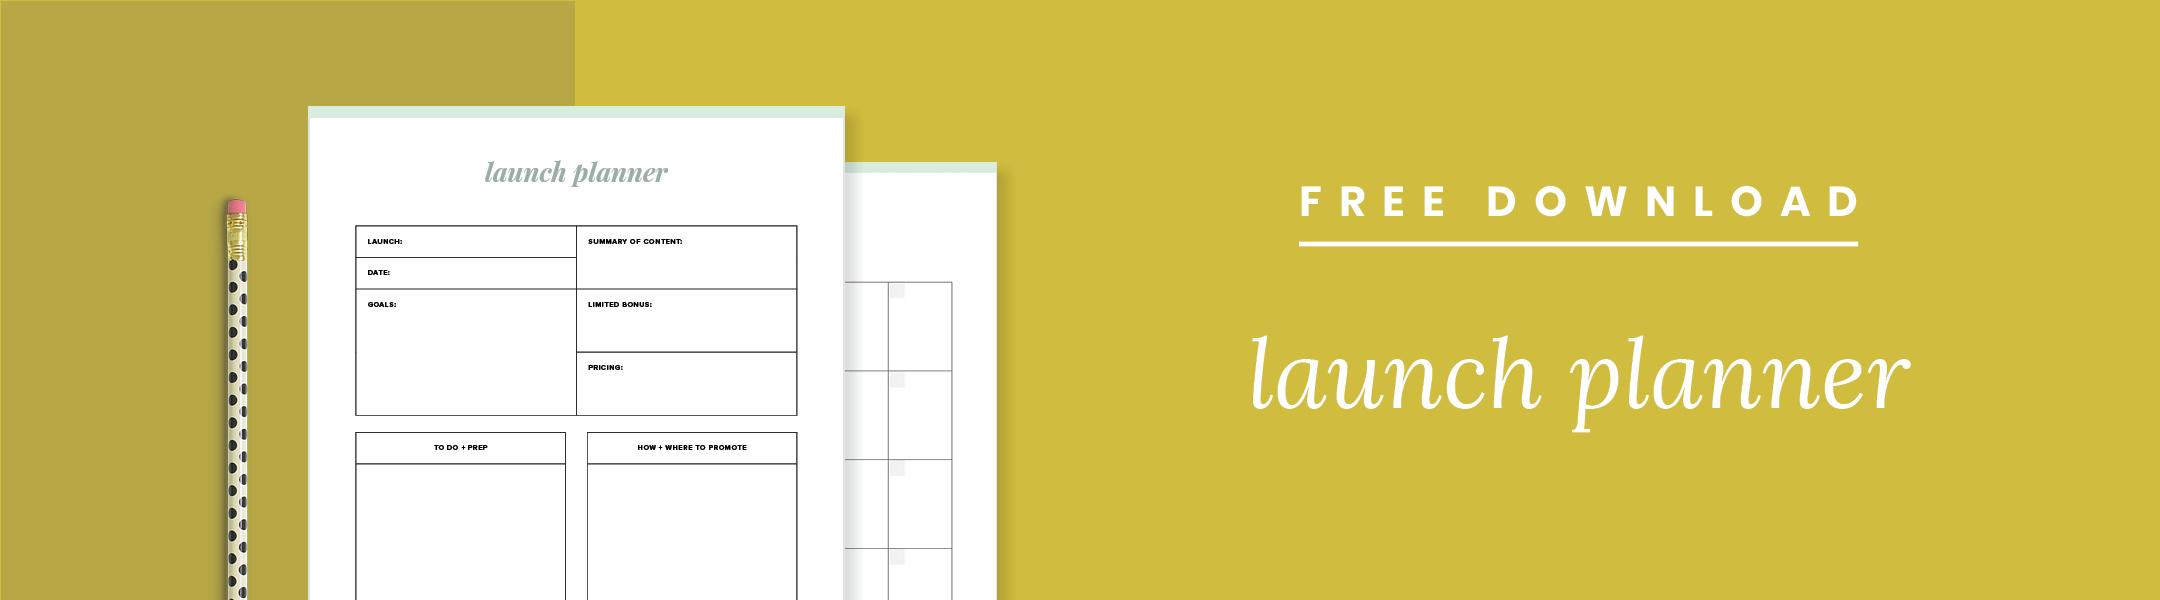 Free Launch Planner download –Paper + Oats –www.paperandoats.com